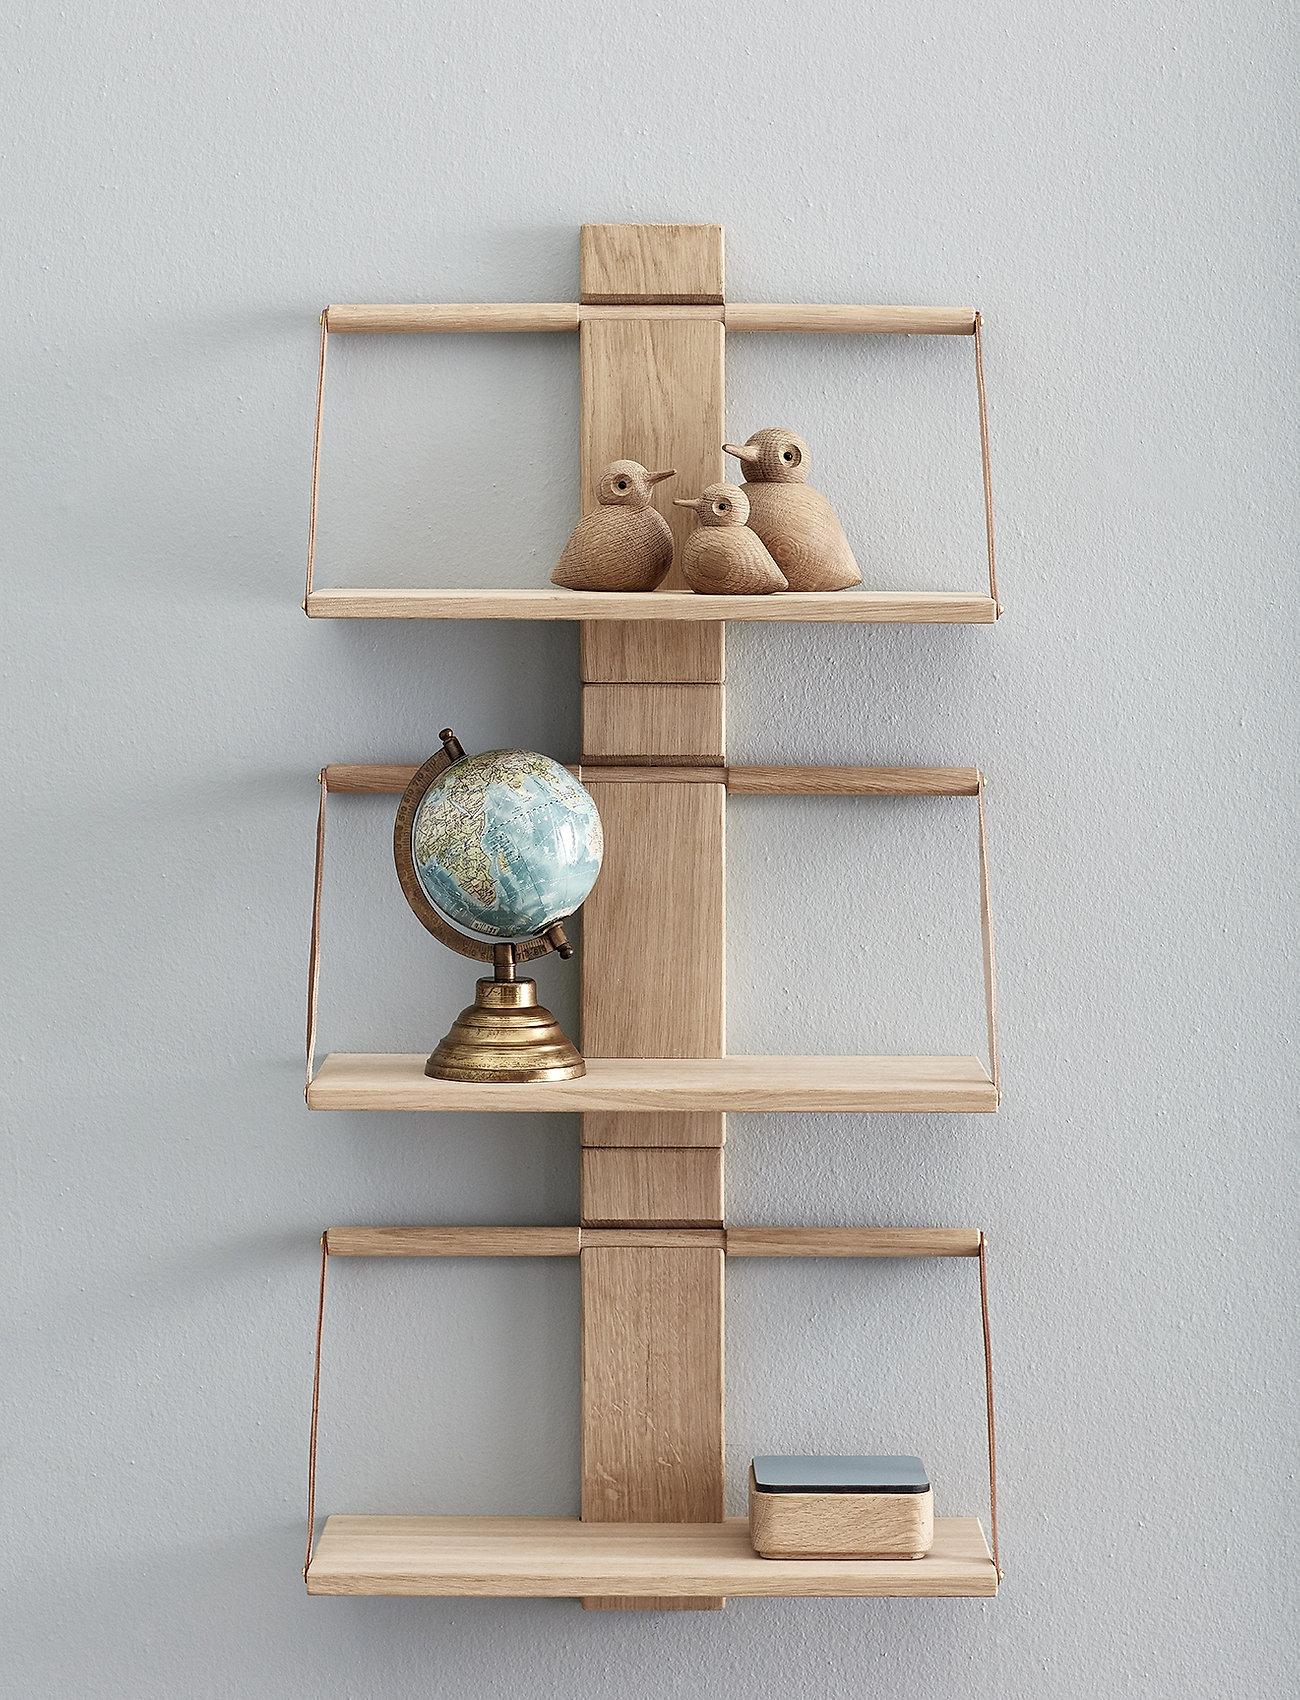 Andersen Furniture - Shelf Wood Wall - hyller & oppbevaring - no color - 1